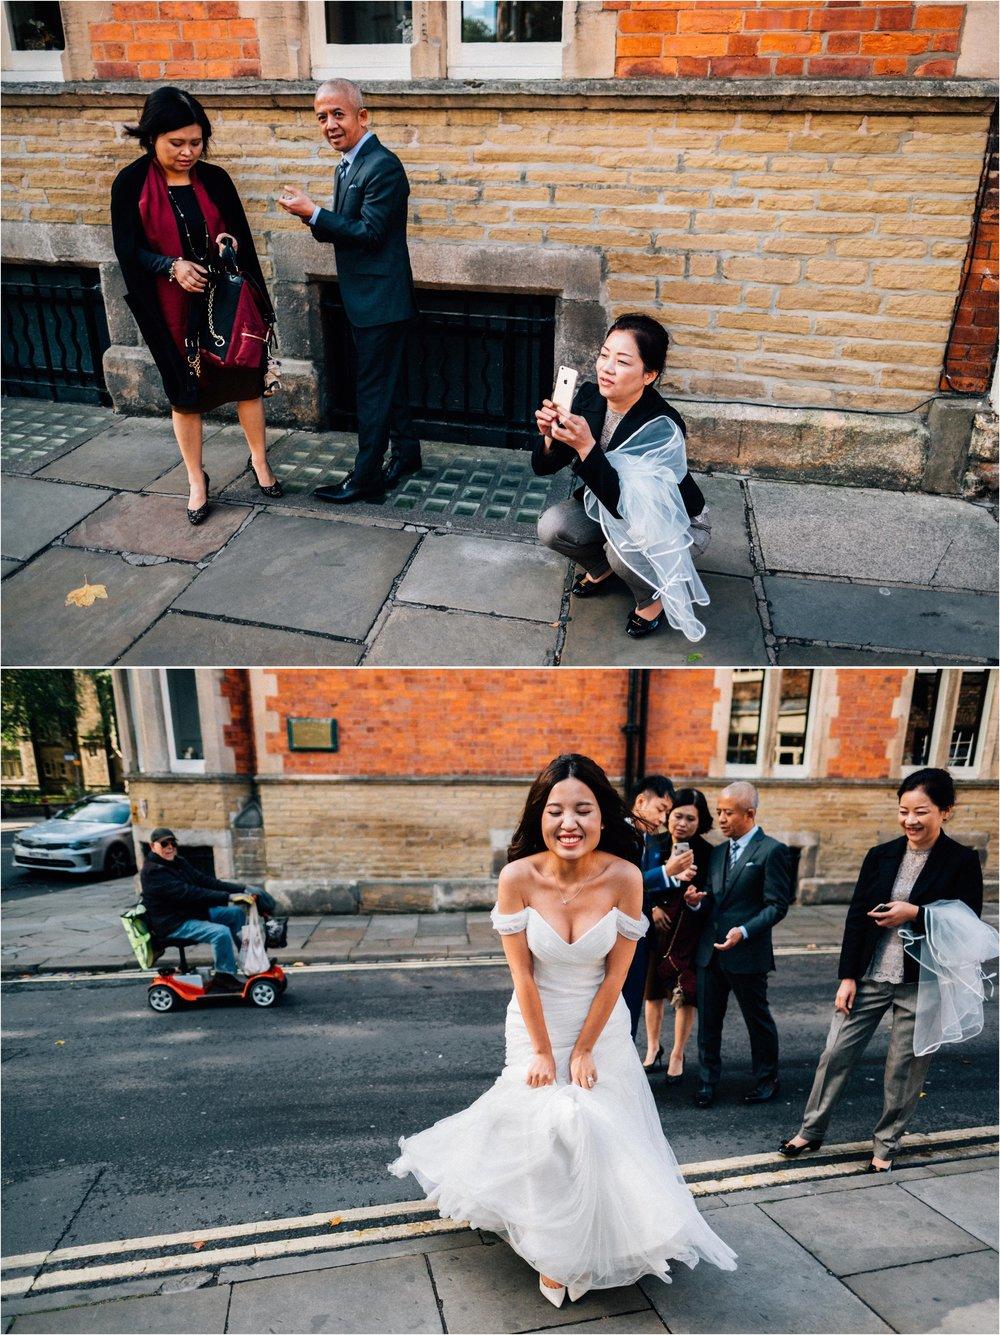 York city elopement wedding photographer_0071.jpg